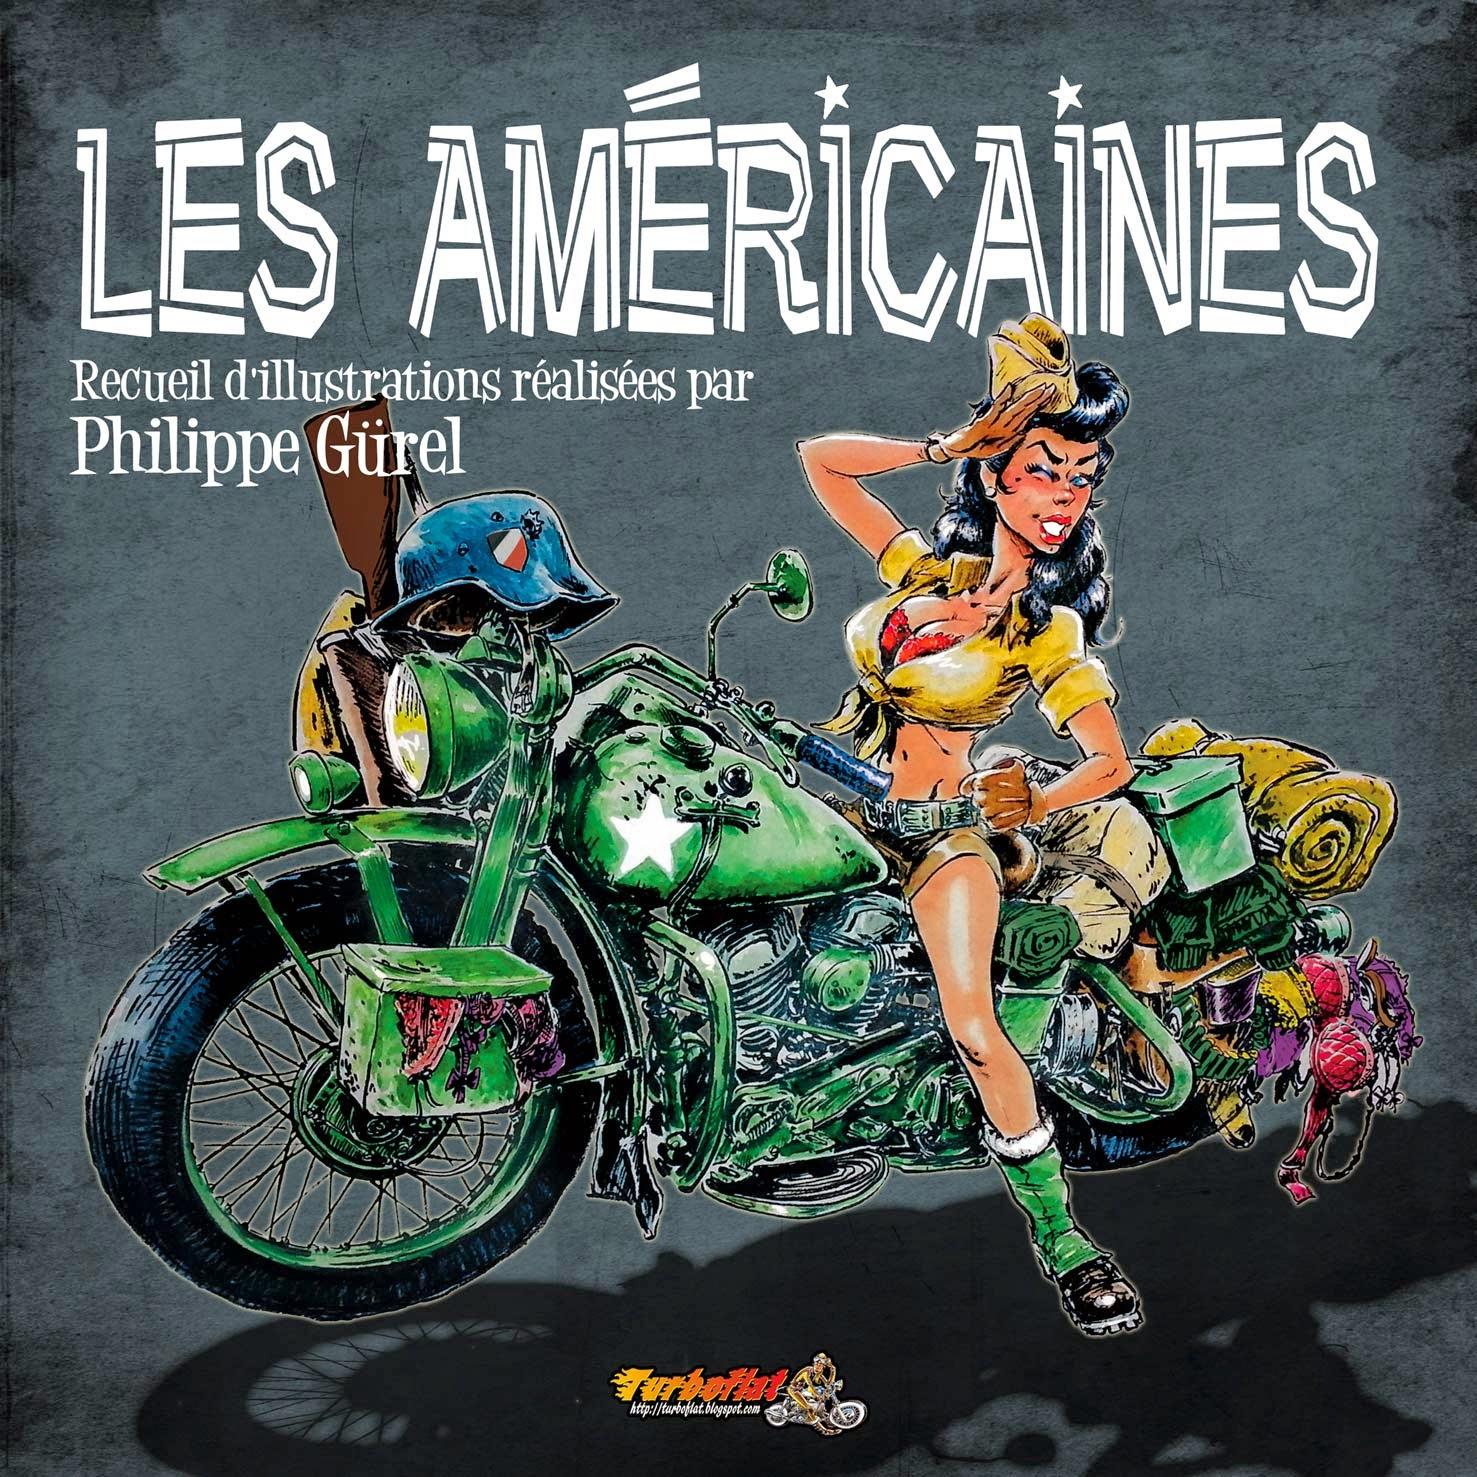 Les Americaines